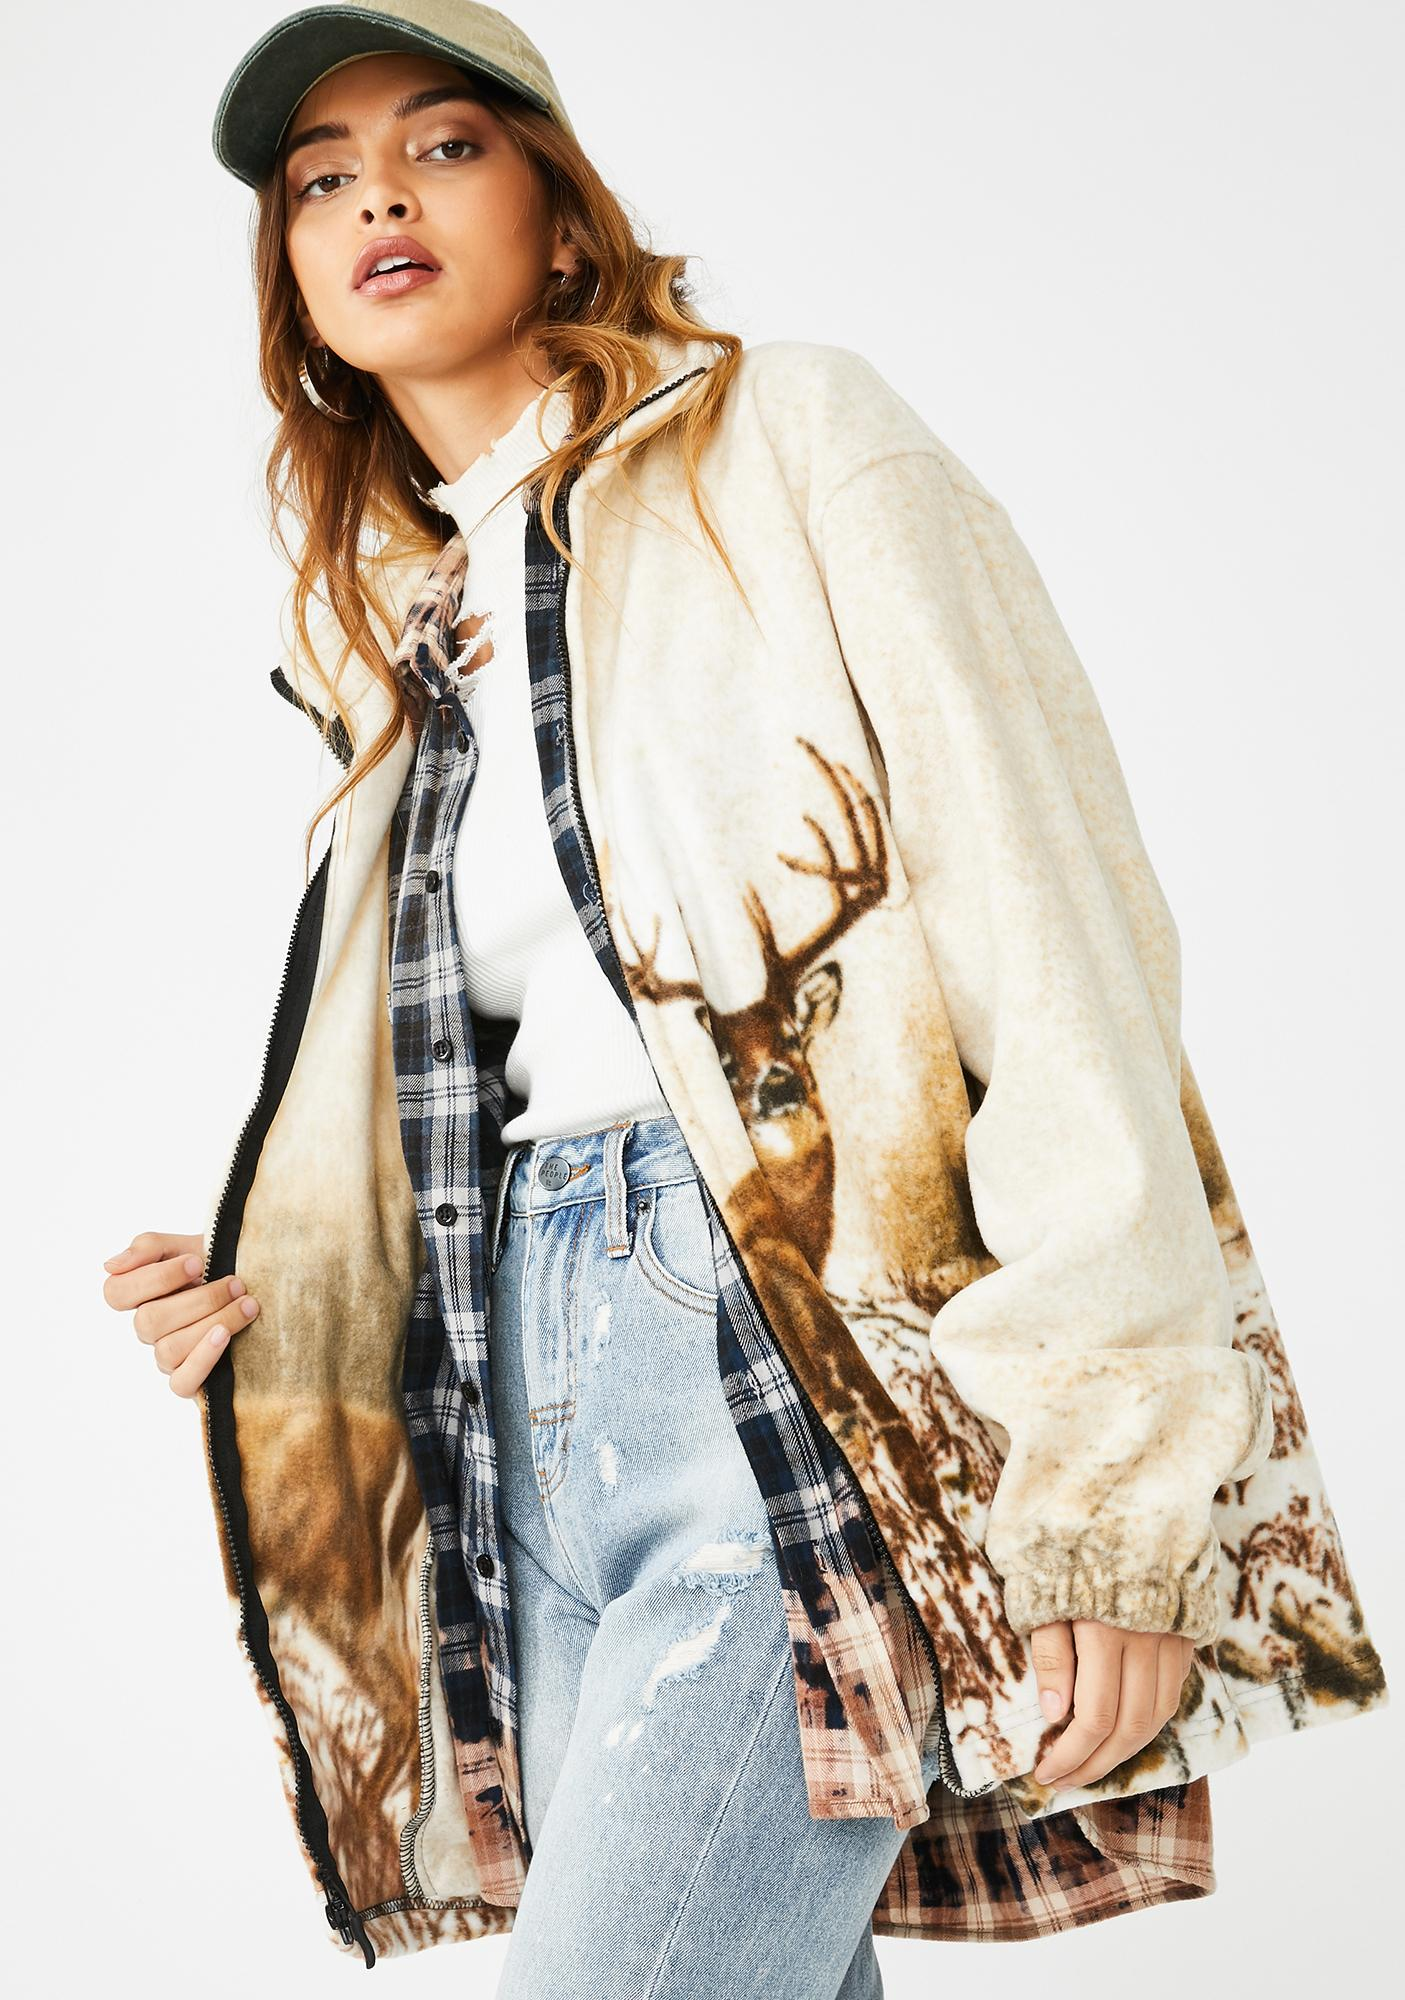 Wildkind No Bucks Given Fleece Jacket